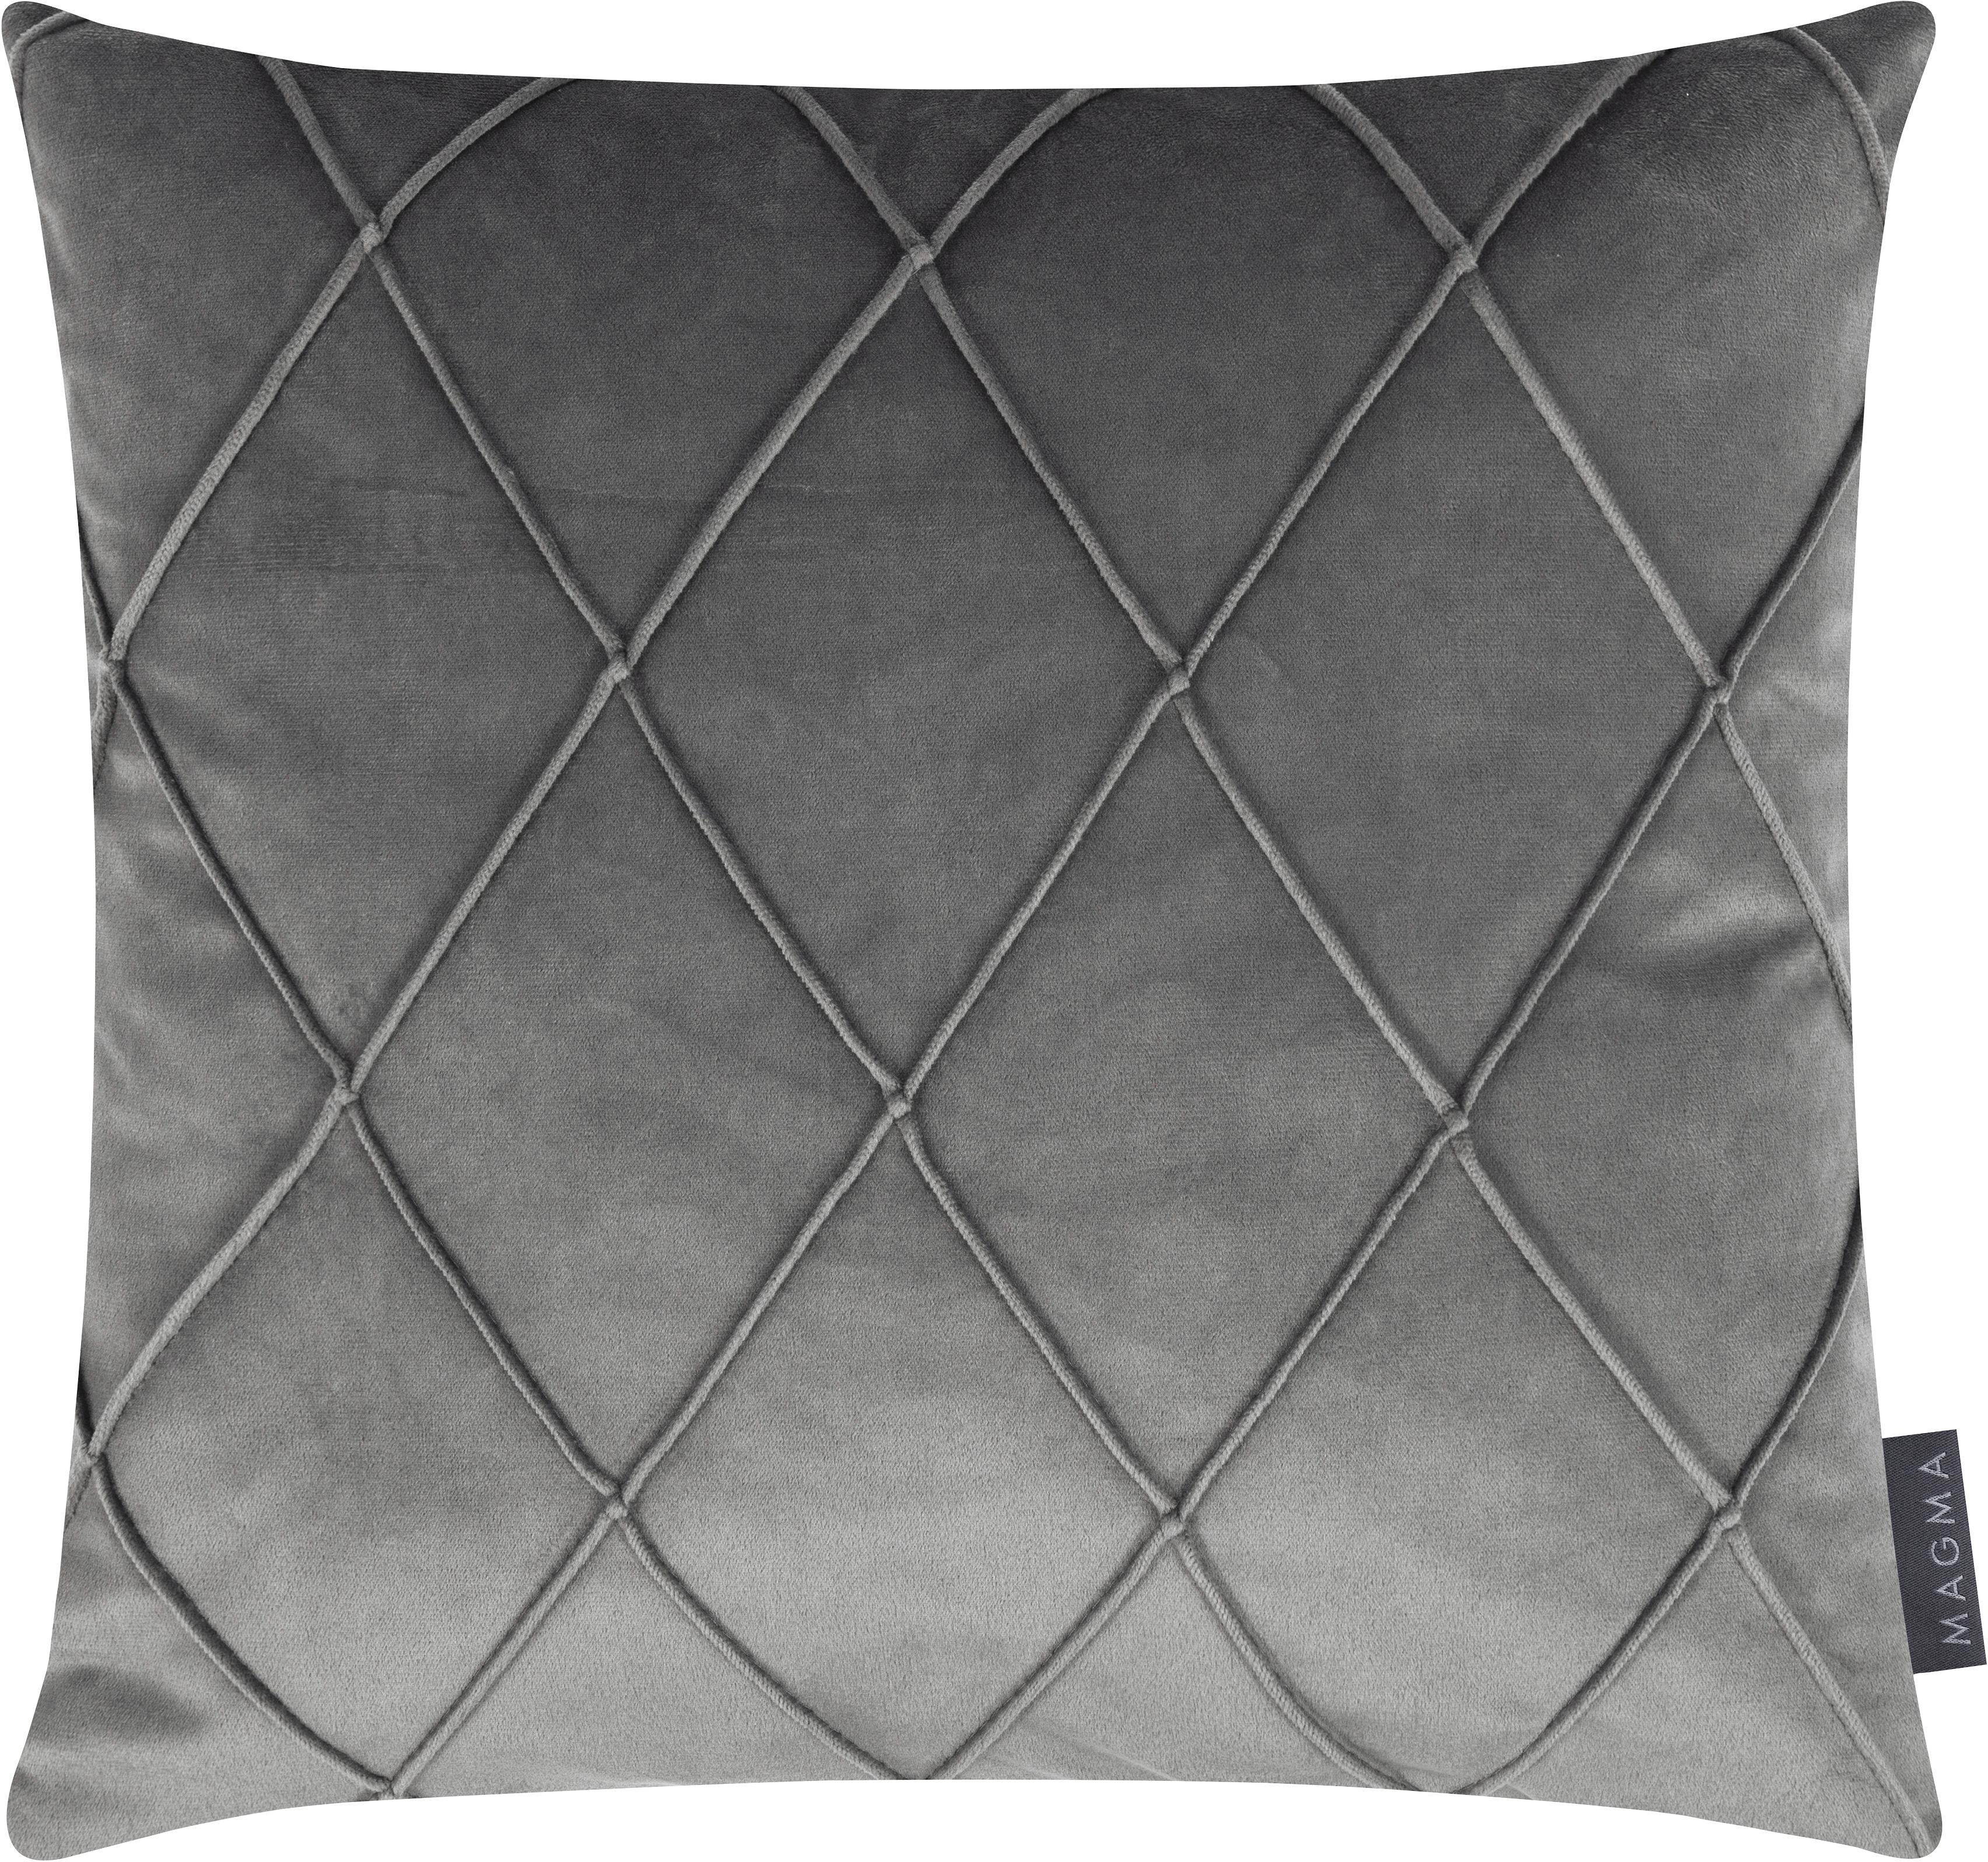 Sametový povlak na polštář s plastickým vzorem Nobless, Šedá